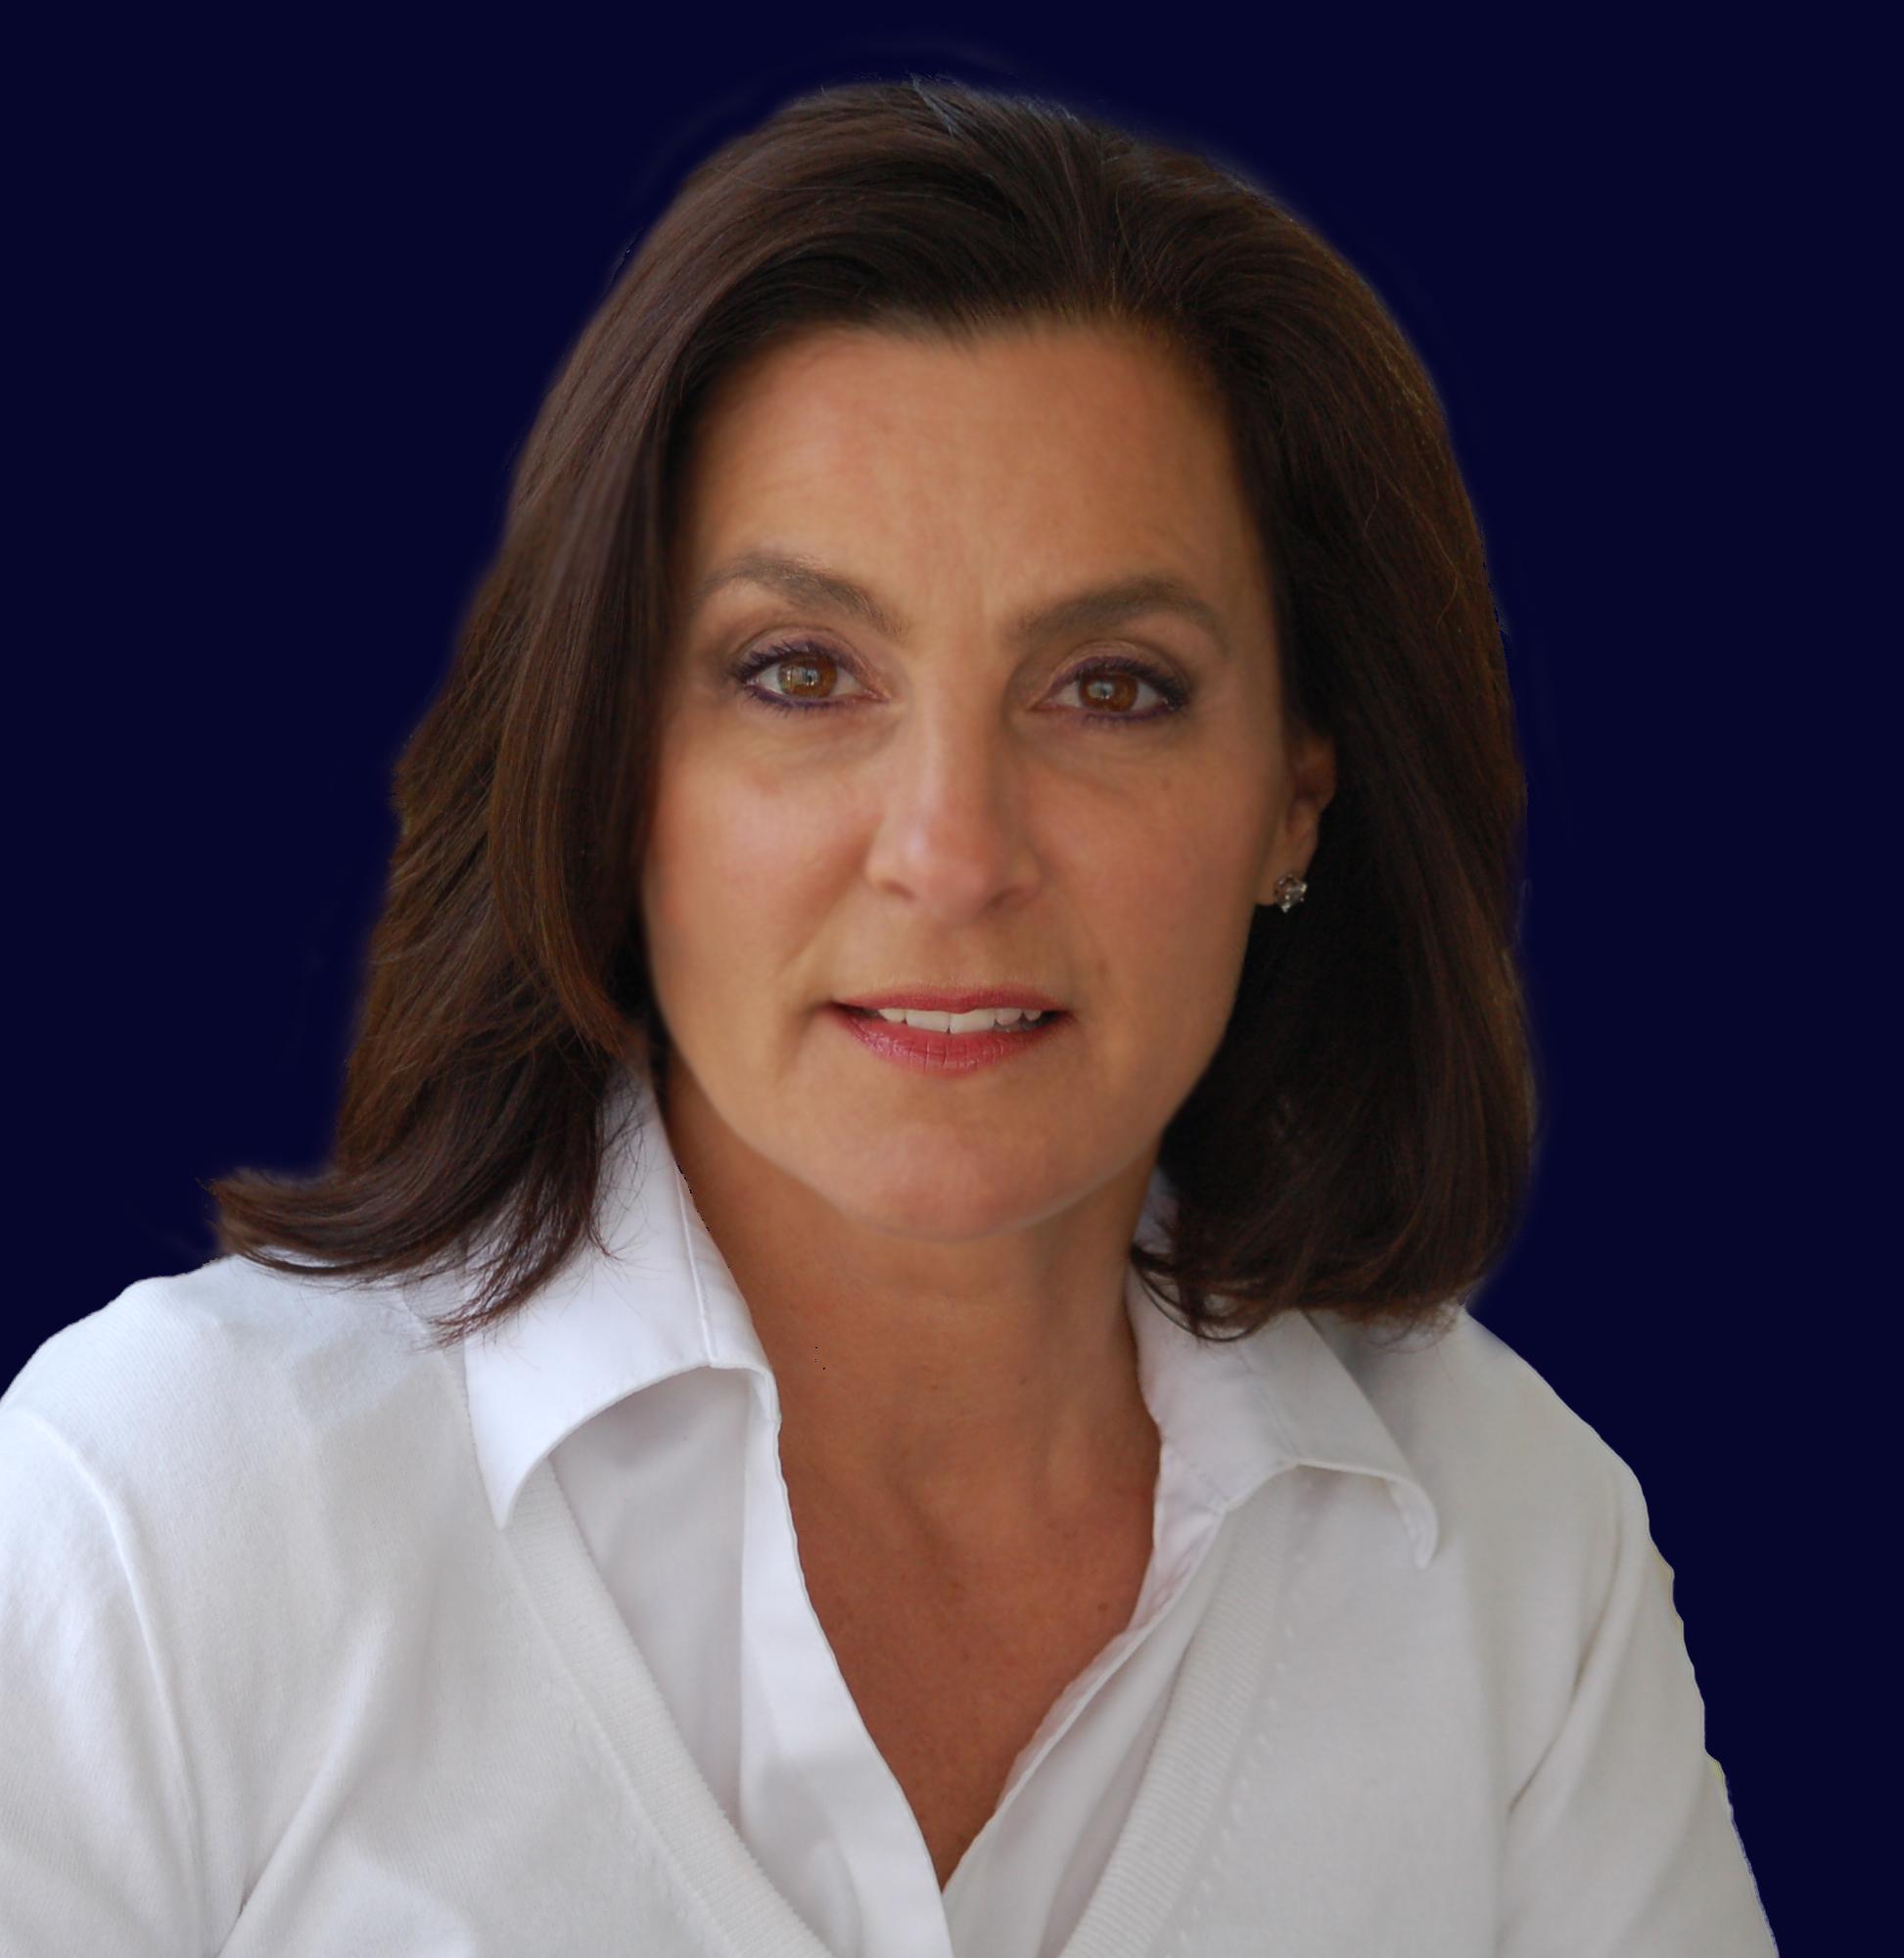 Jeanmarie Braat